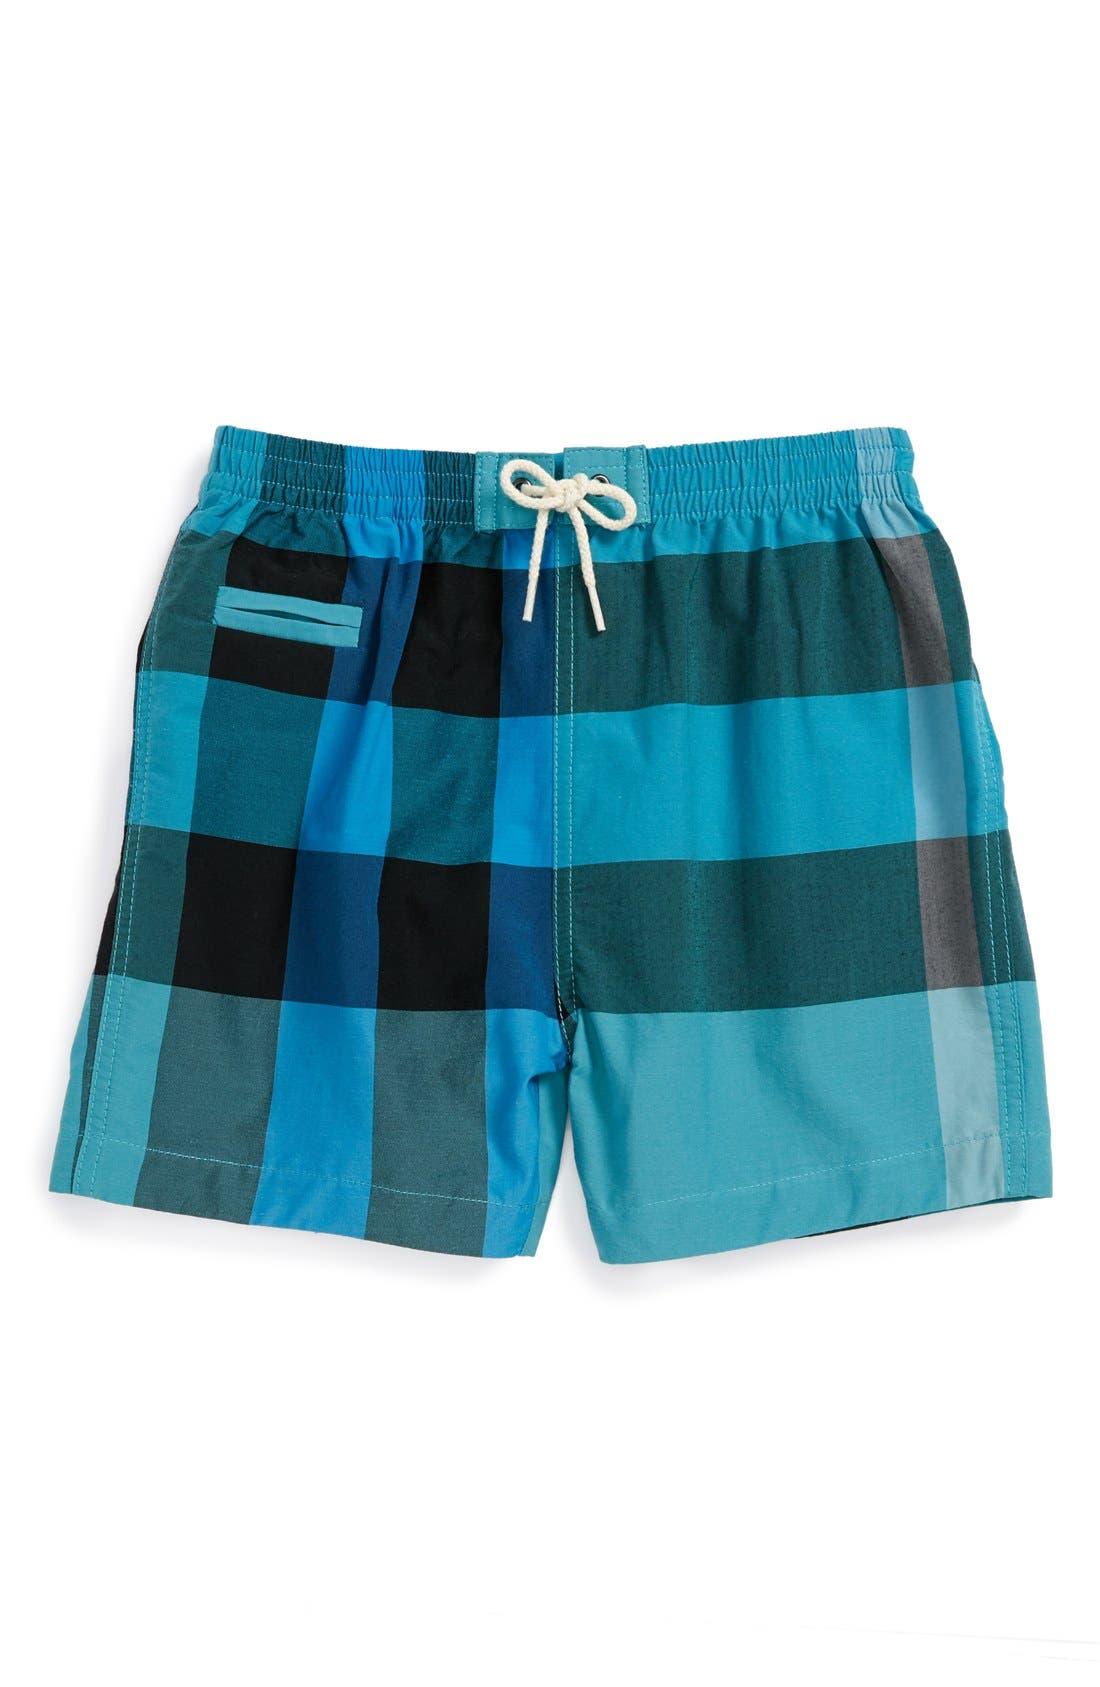 Main Image - Burberry Check Print Swim Shorts (Baby Boys)